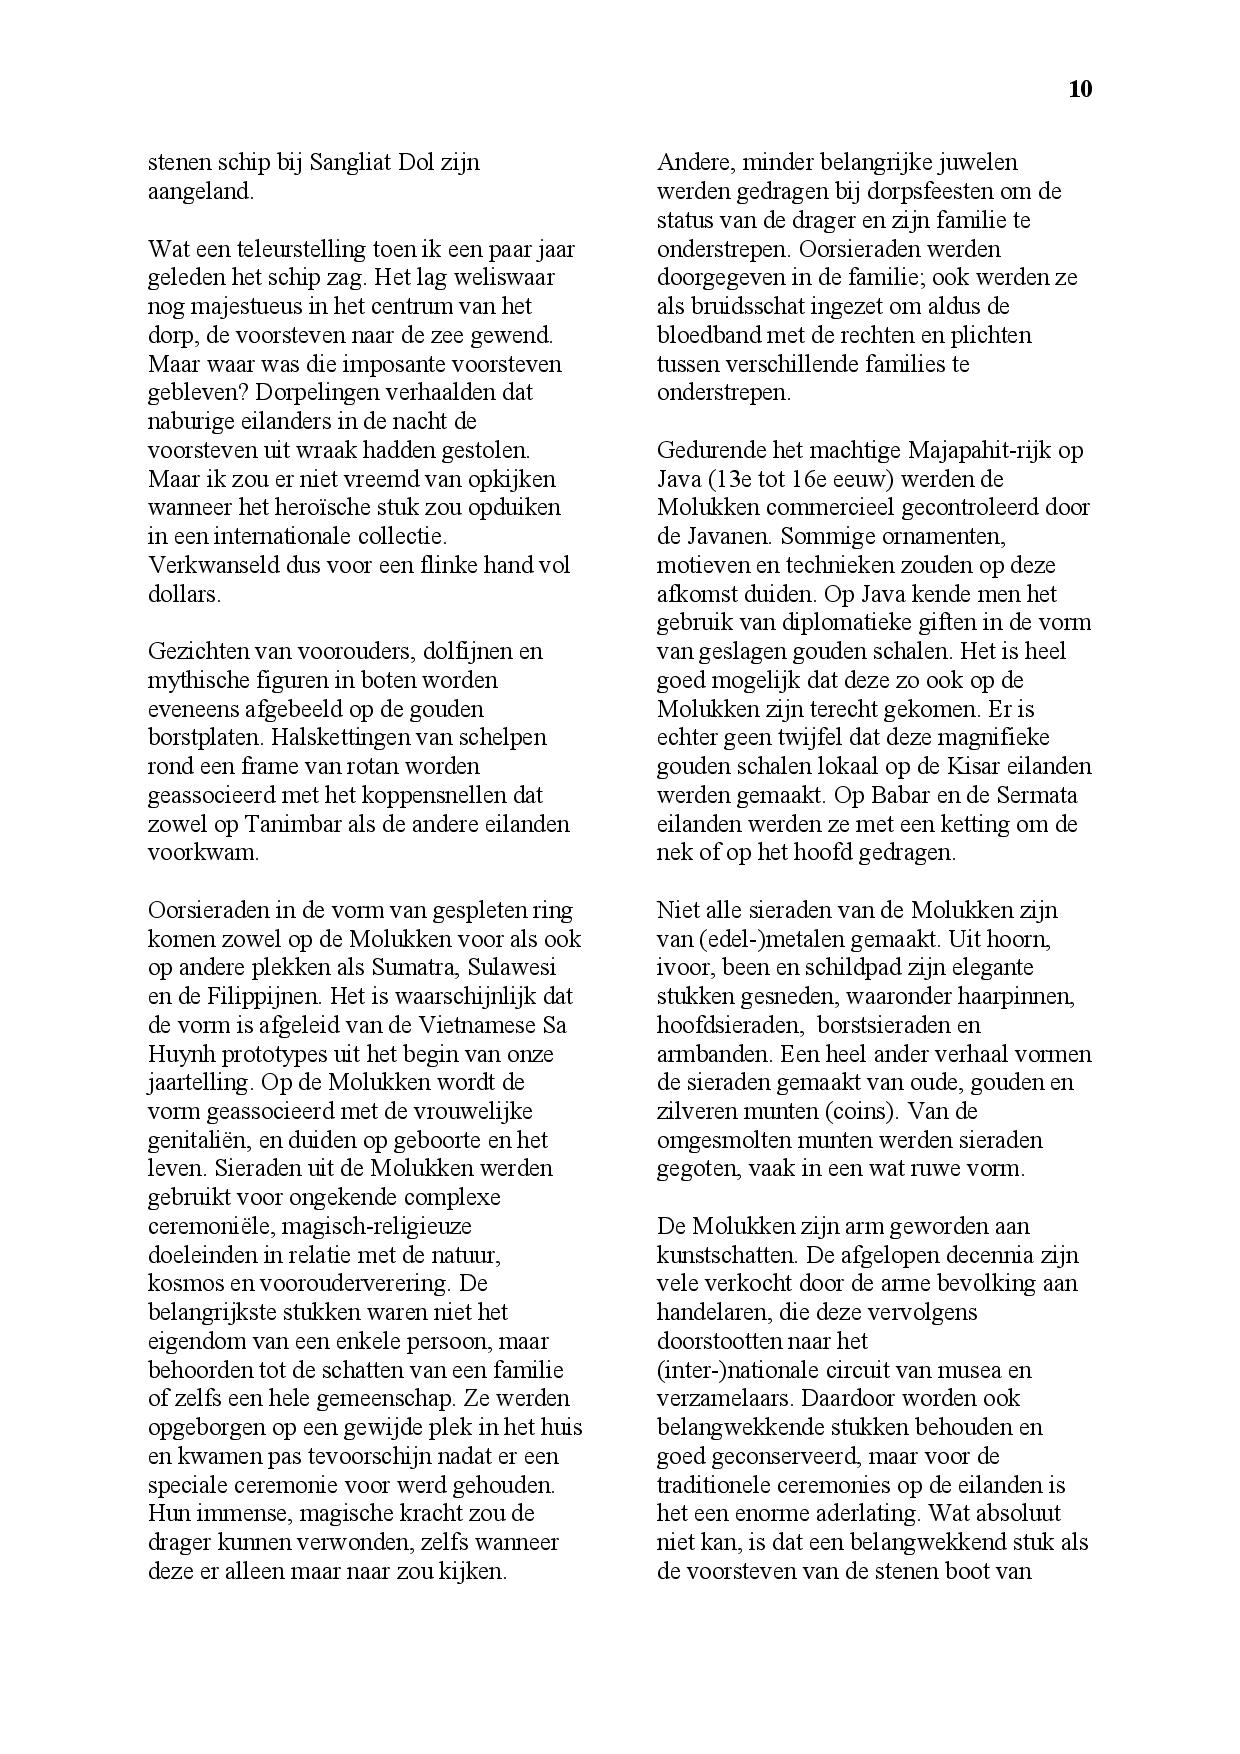 Saka Mese 3e jaargang nr. 02-2007 definitieve webversie-page-010